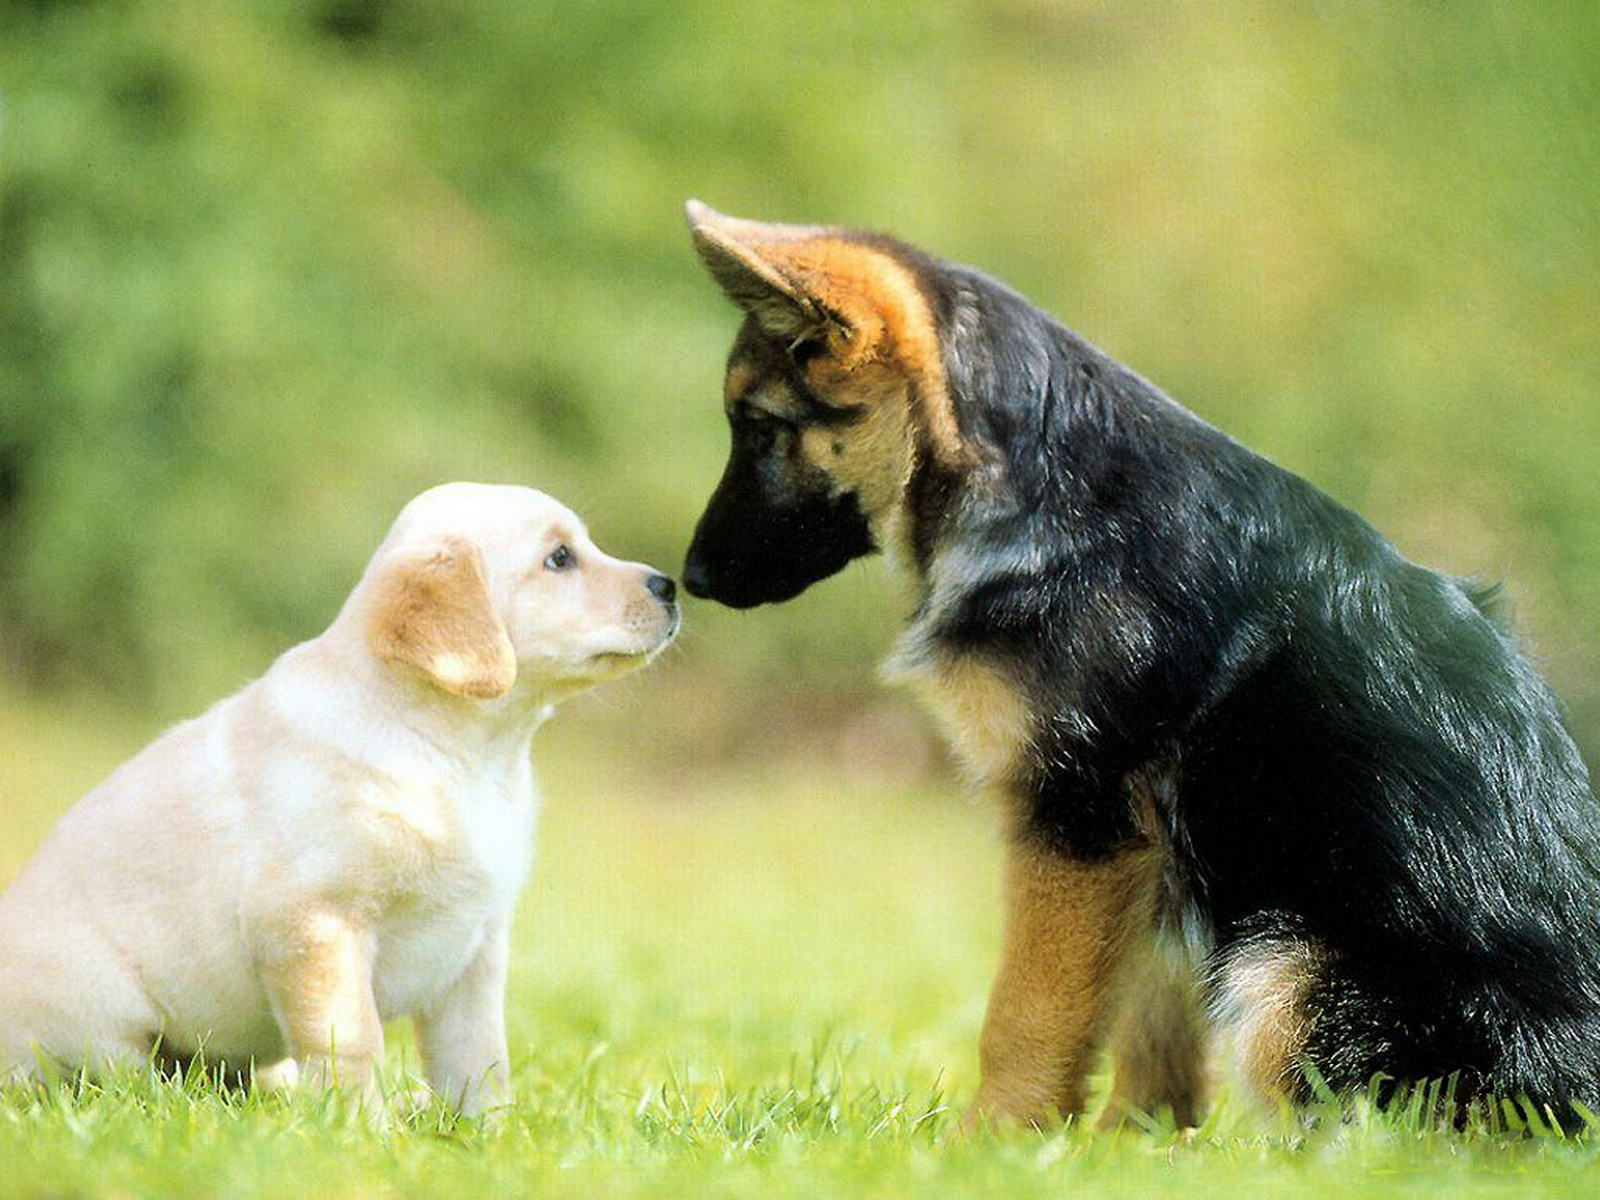 48] Cute Puppy Wallpaper HD on WallpaperSafari 1600x1200